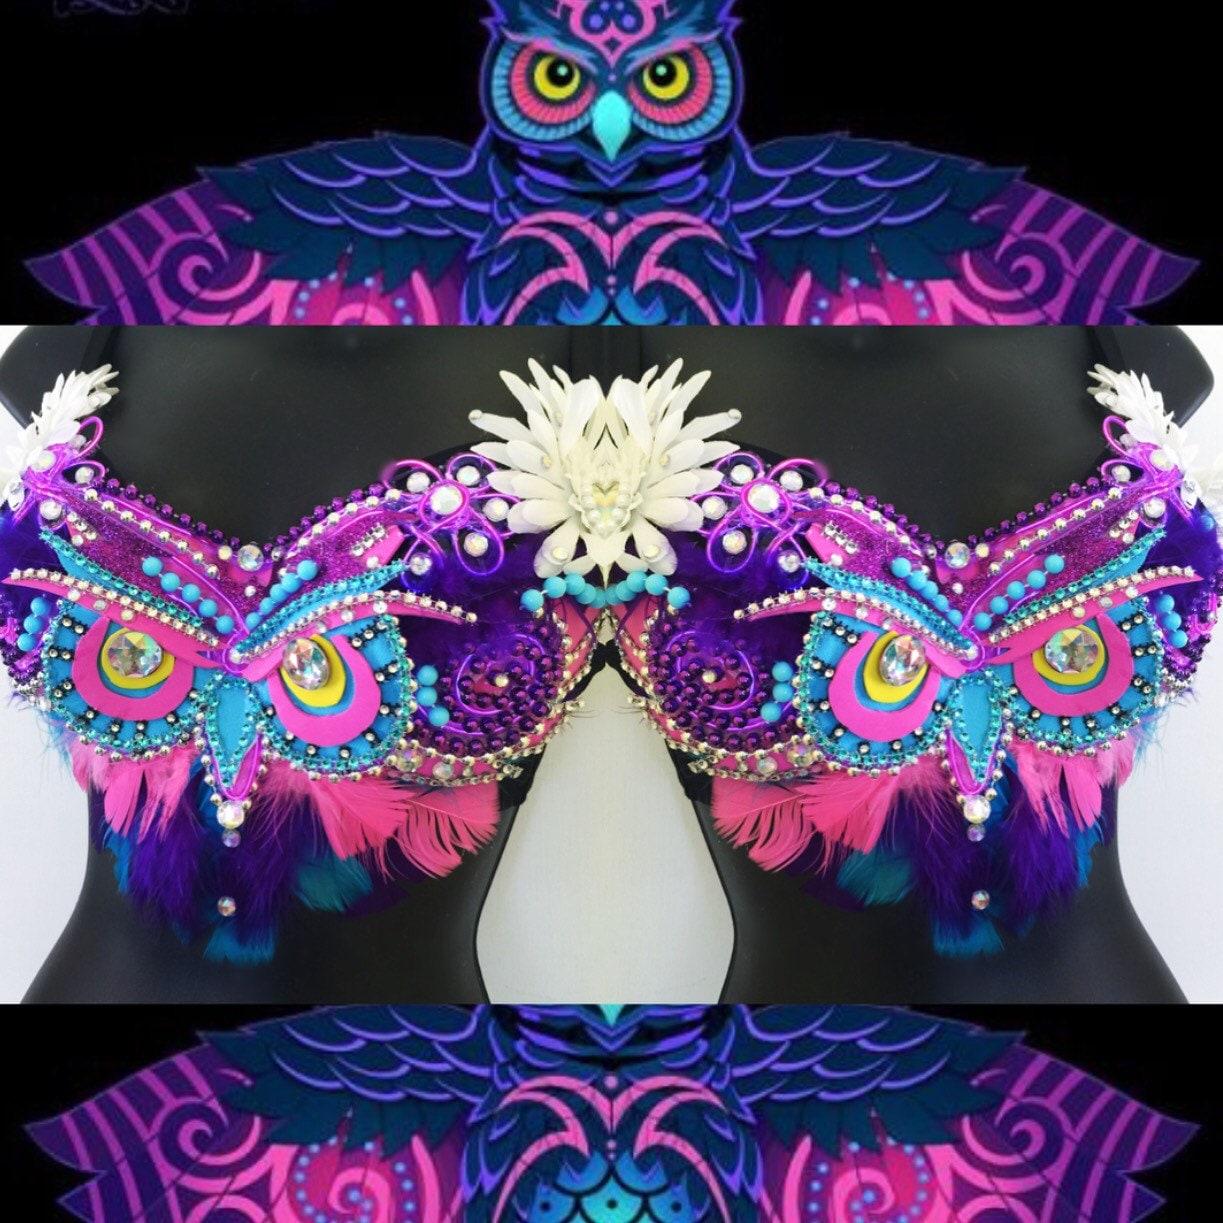 Electric Owl Bra LED lights: rave wear festival edm rave